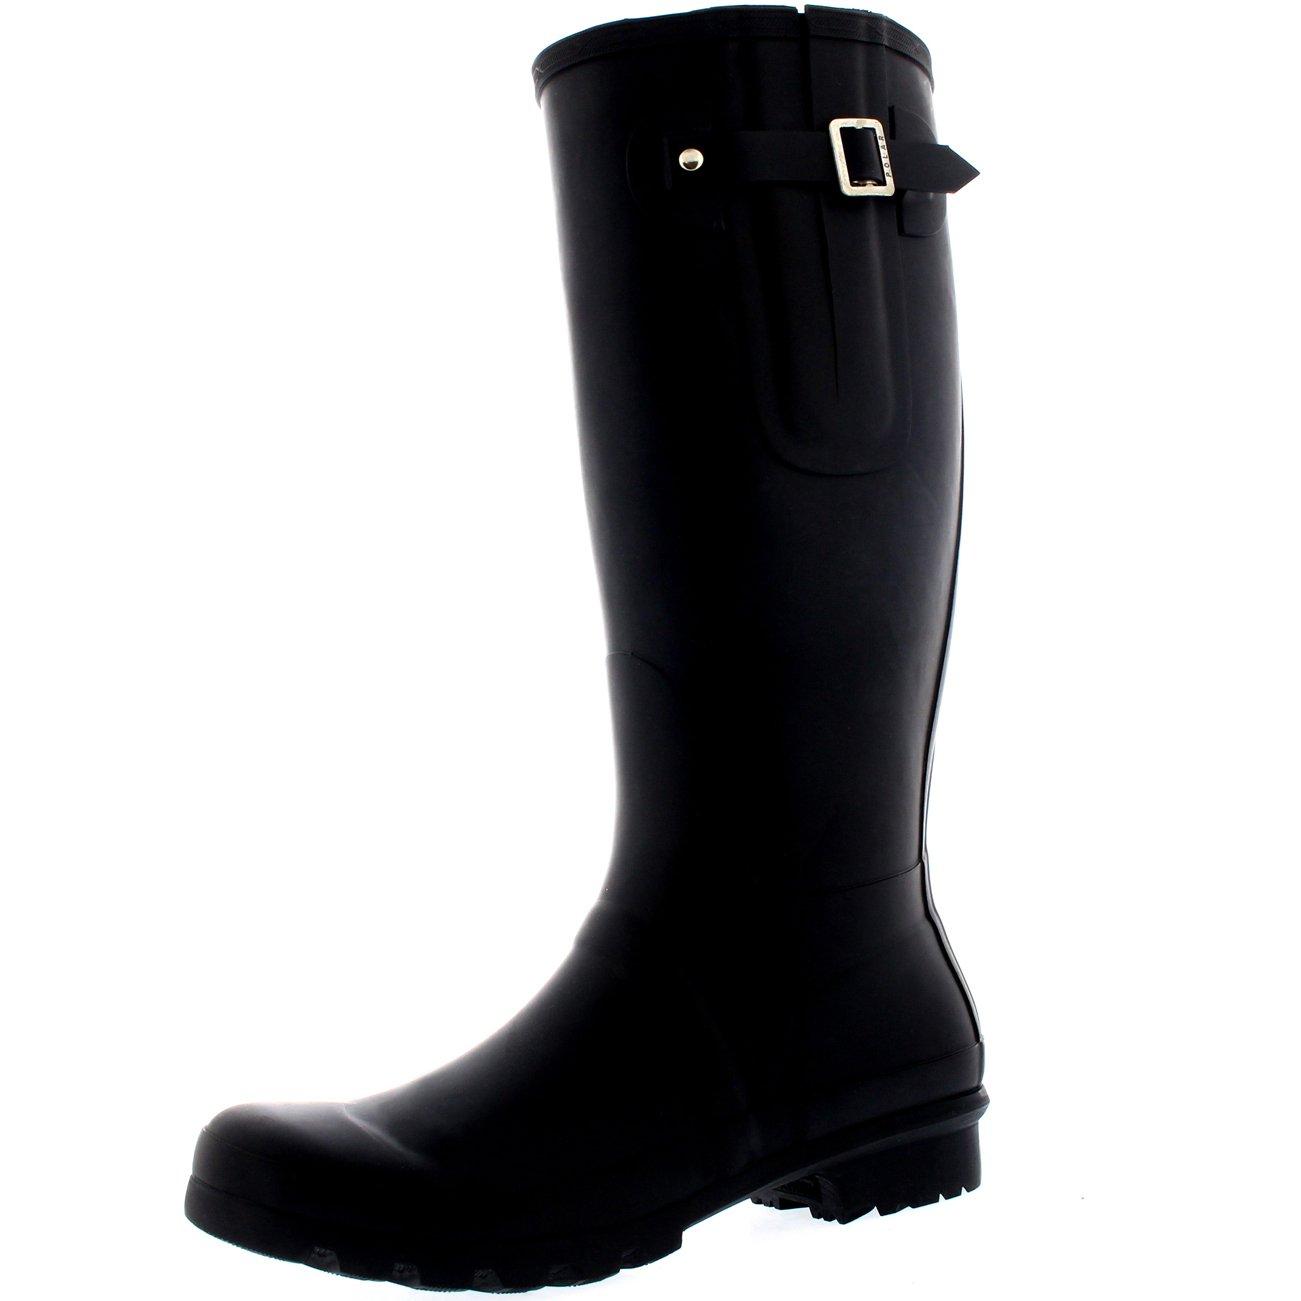 Polar Mens Tall Adjustable Side Waterproof Rubber Wellie Wellington Rain Boots - Black - US13/EU46 - BL0236